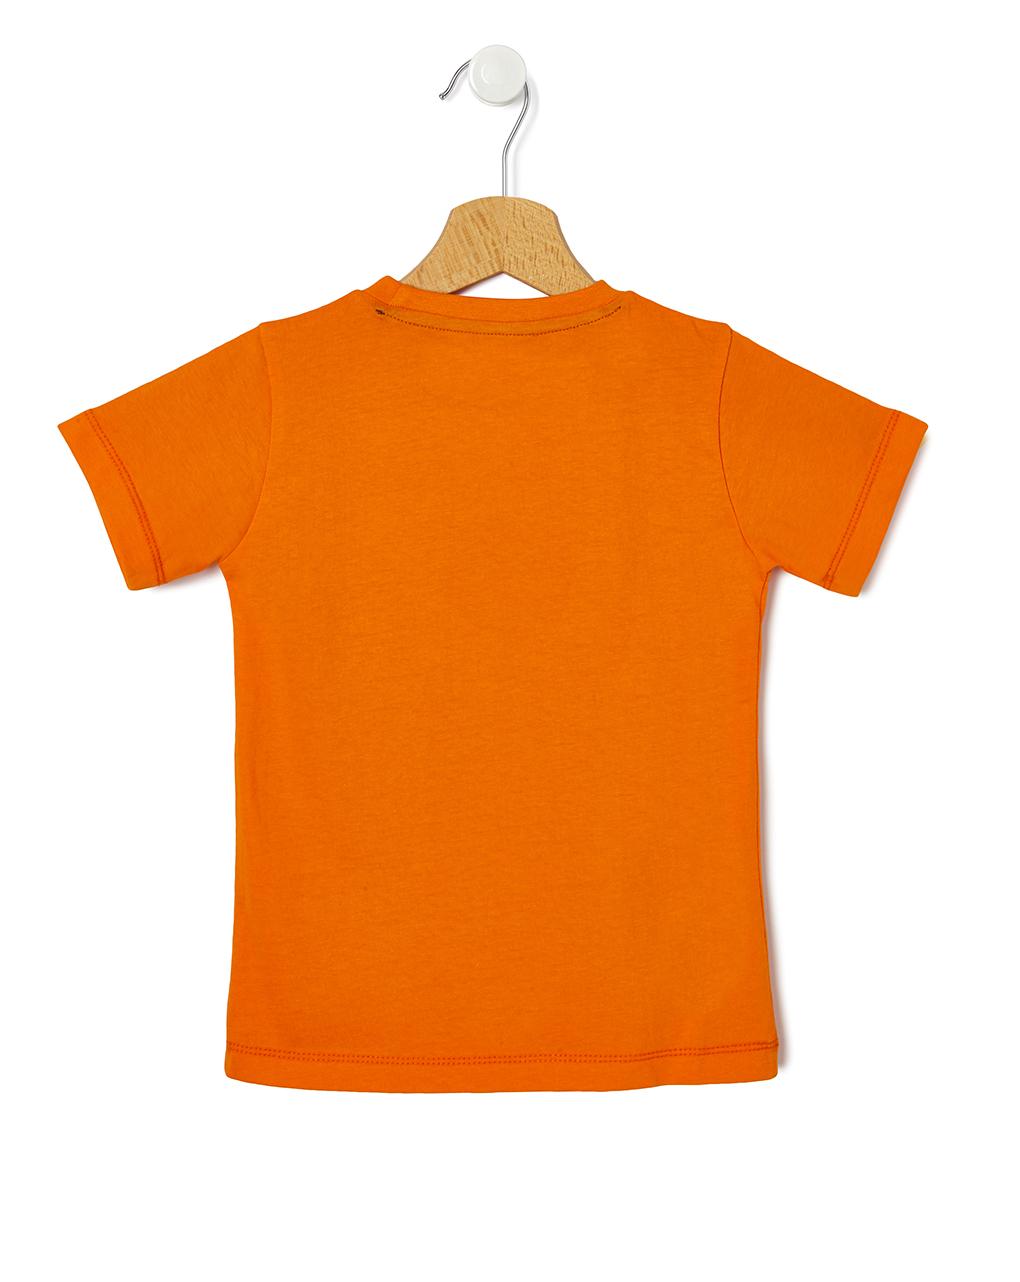 T-shirt stampa granchio - Prénatal